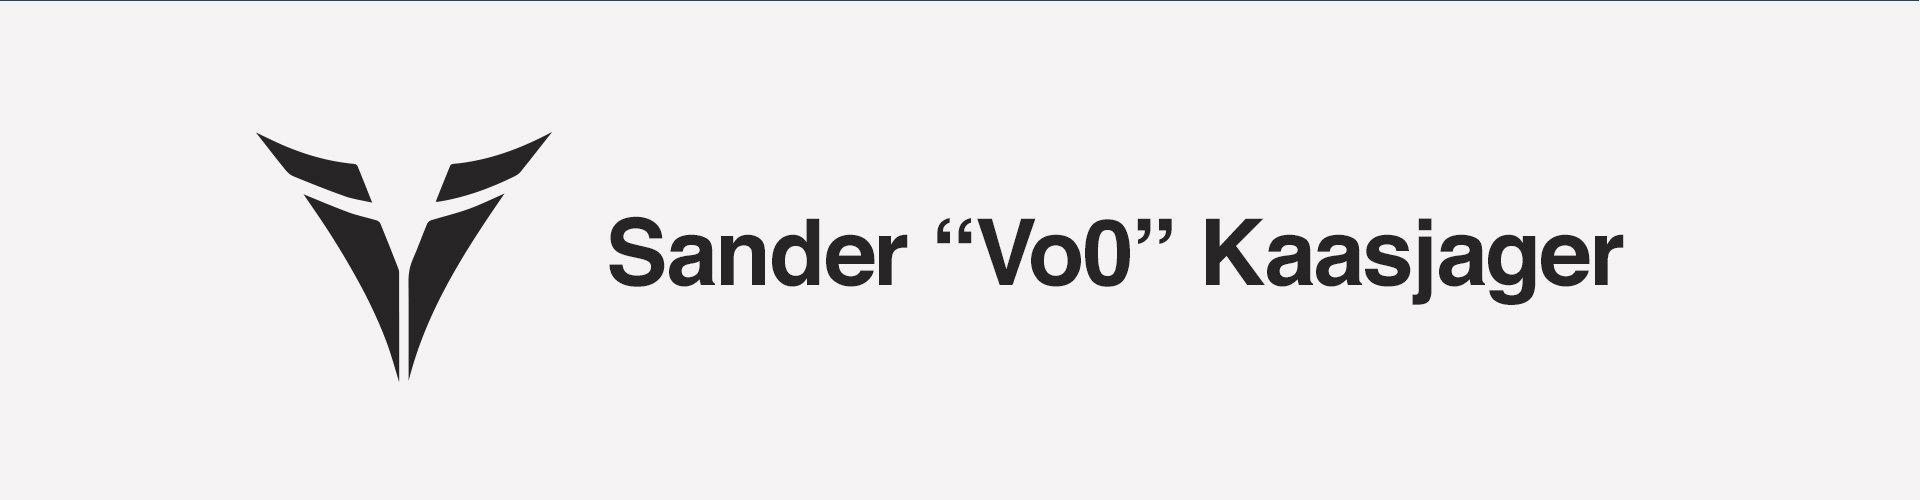 "Sander ""Vo0"" Kaasjager"